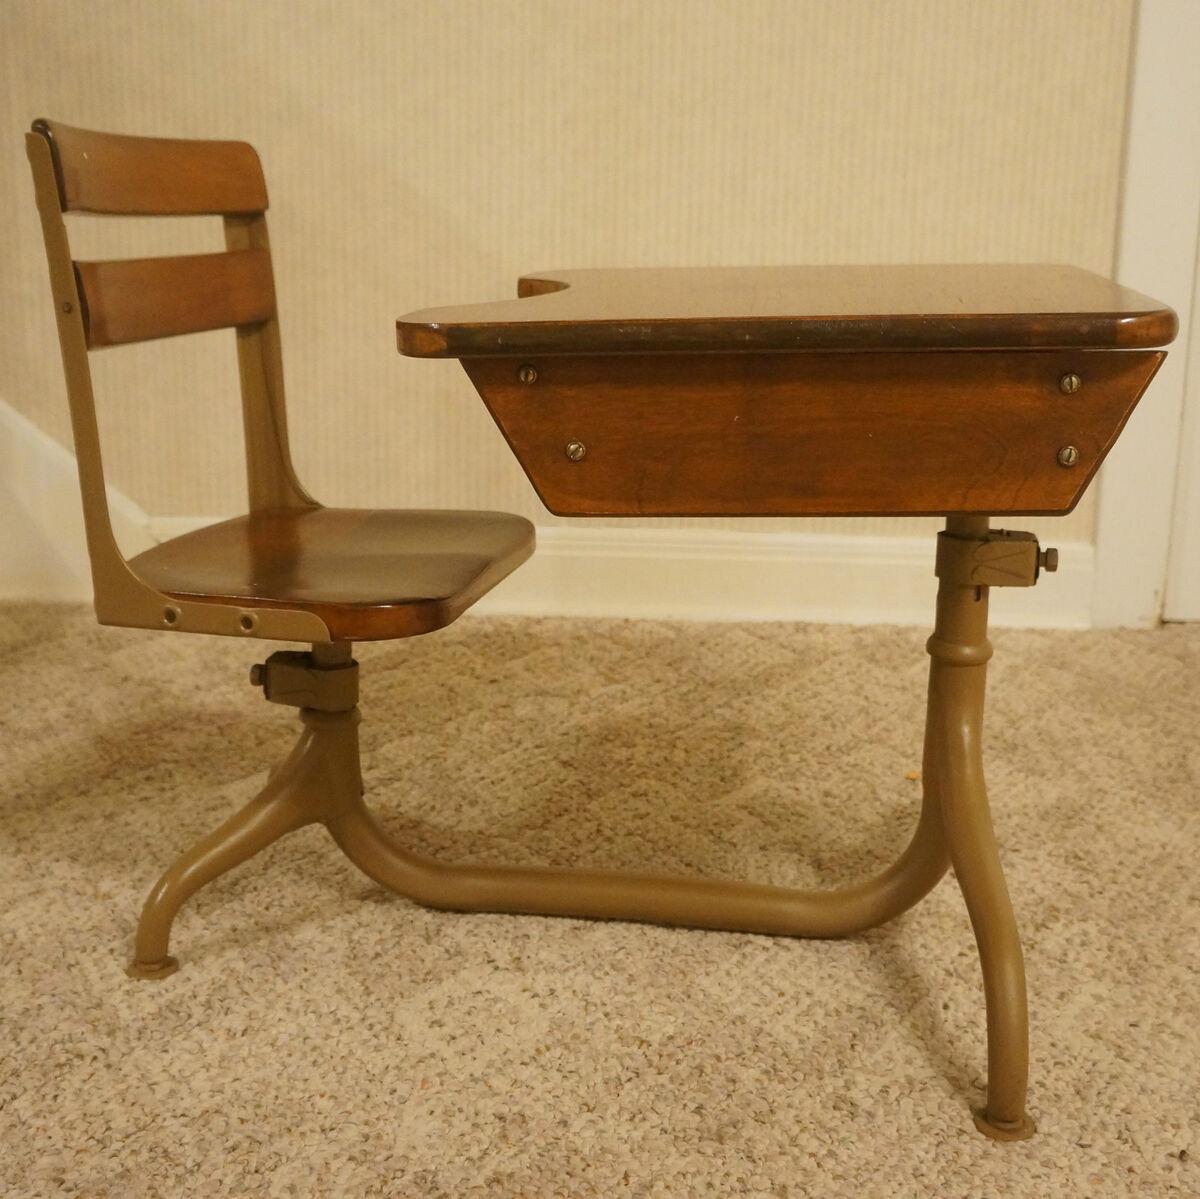 Antique Vintage Wood Metal School Desk Wi Swivel Chair